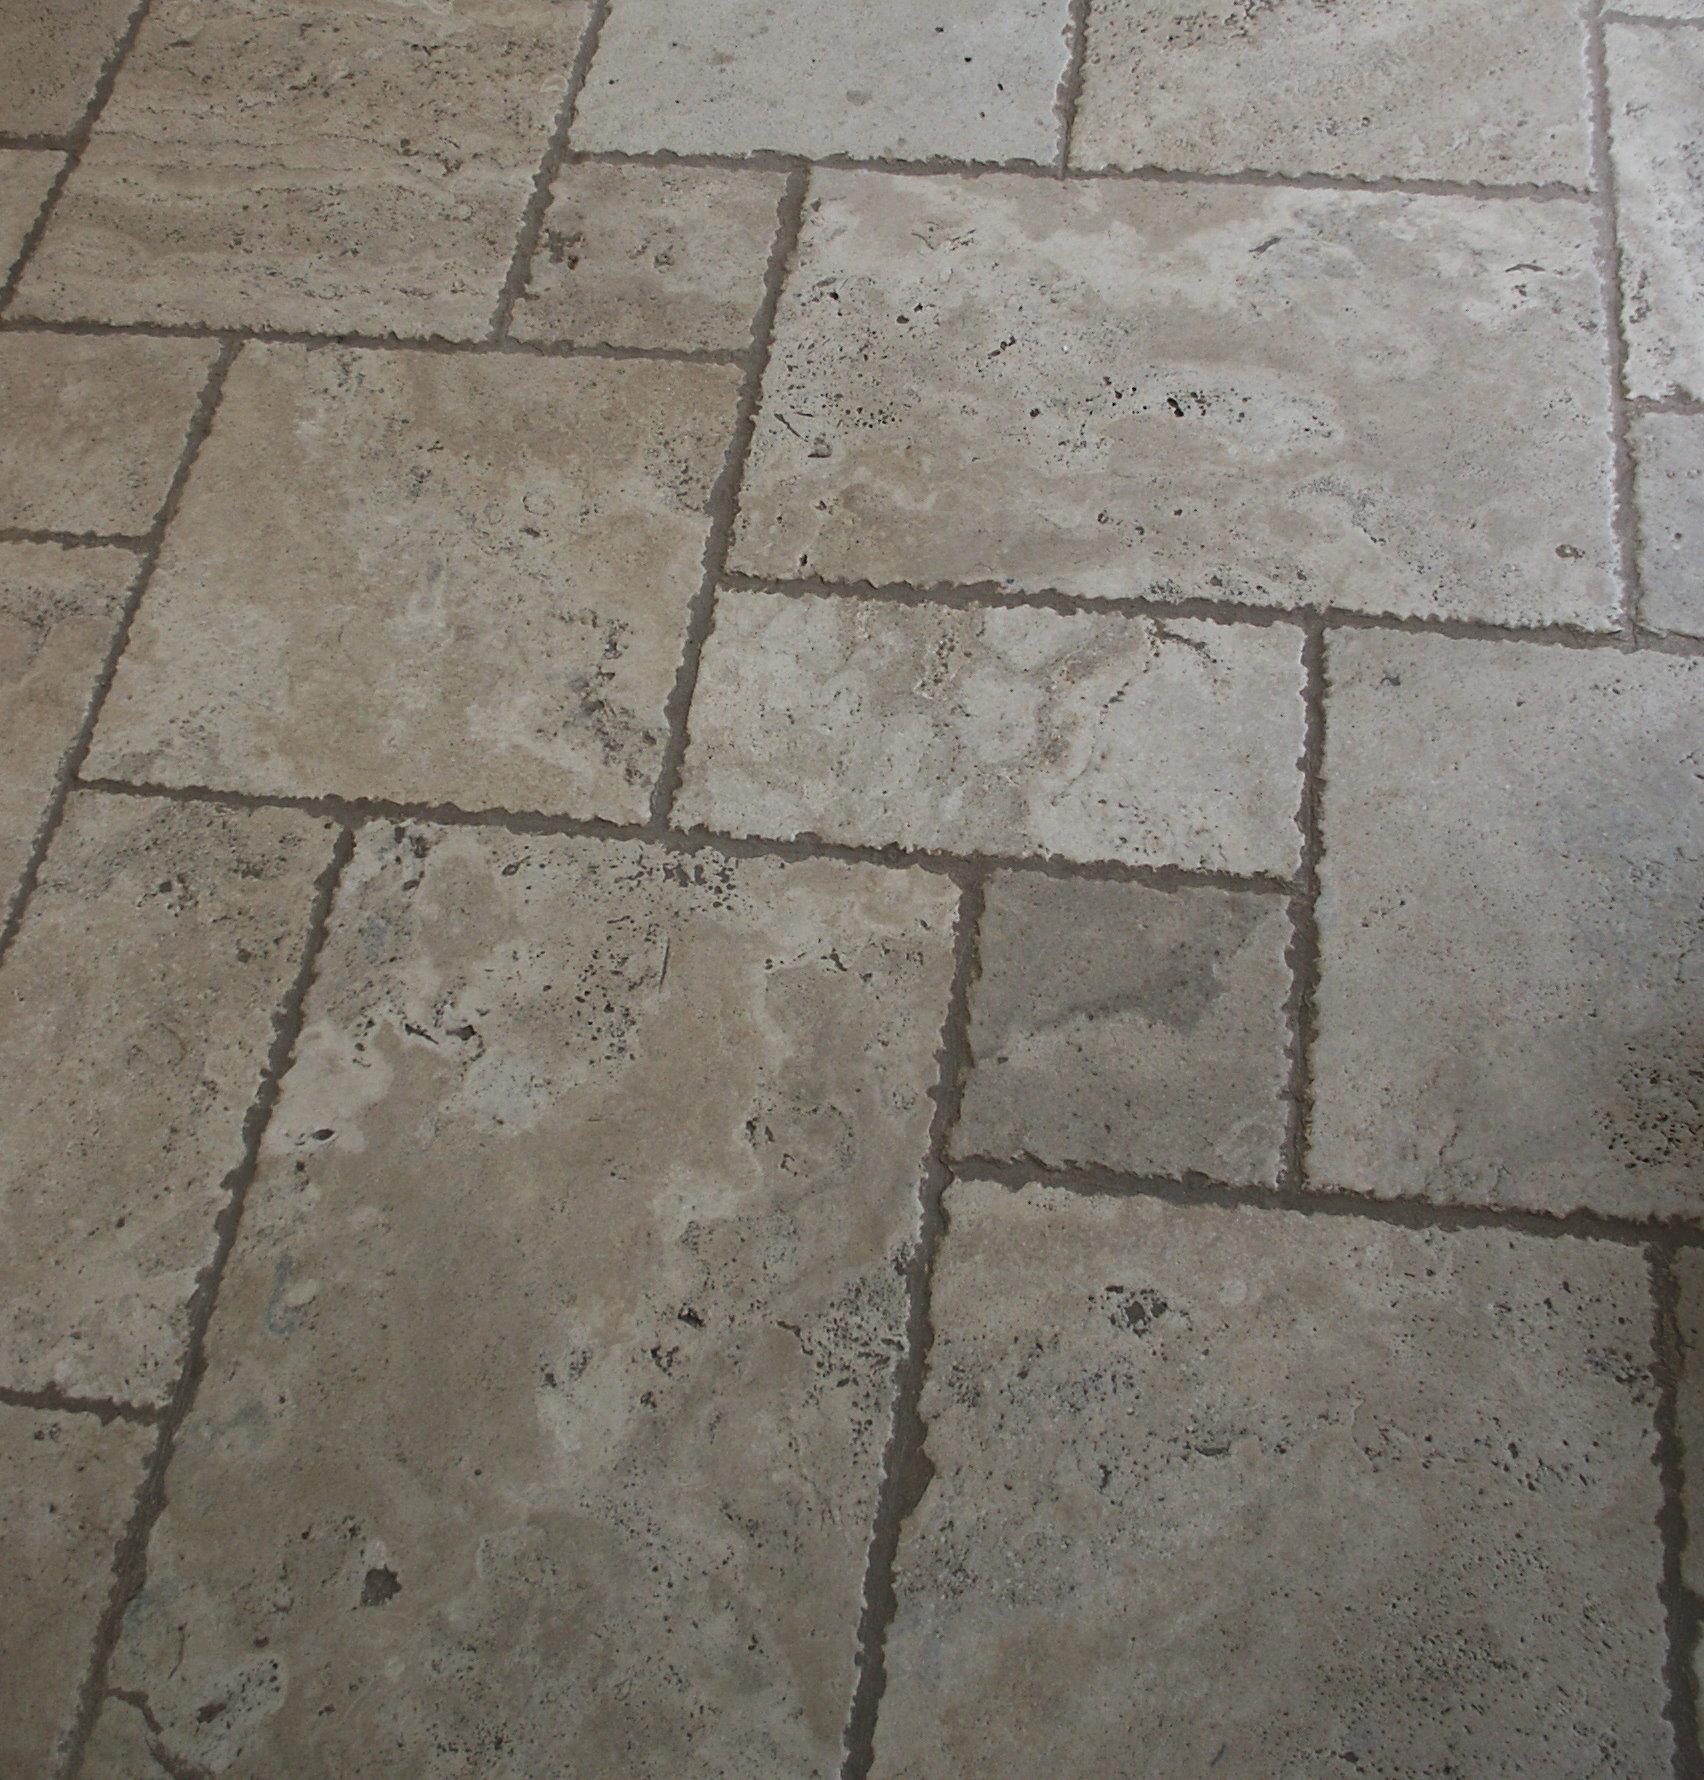 Dark Travertine Tile stone tiles, fireplaces, granite worktops, table tops, shropshire